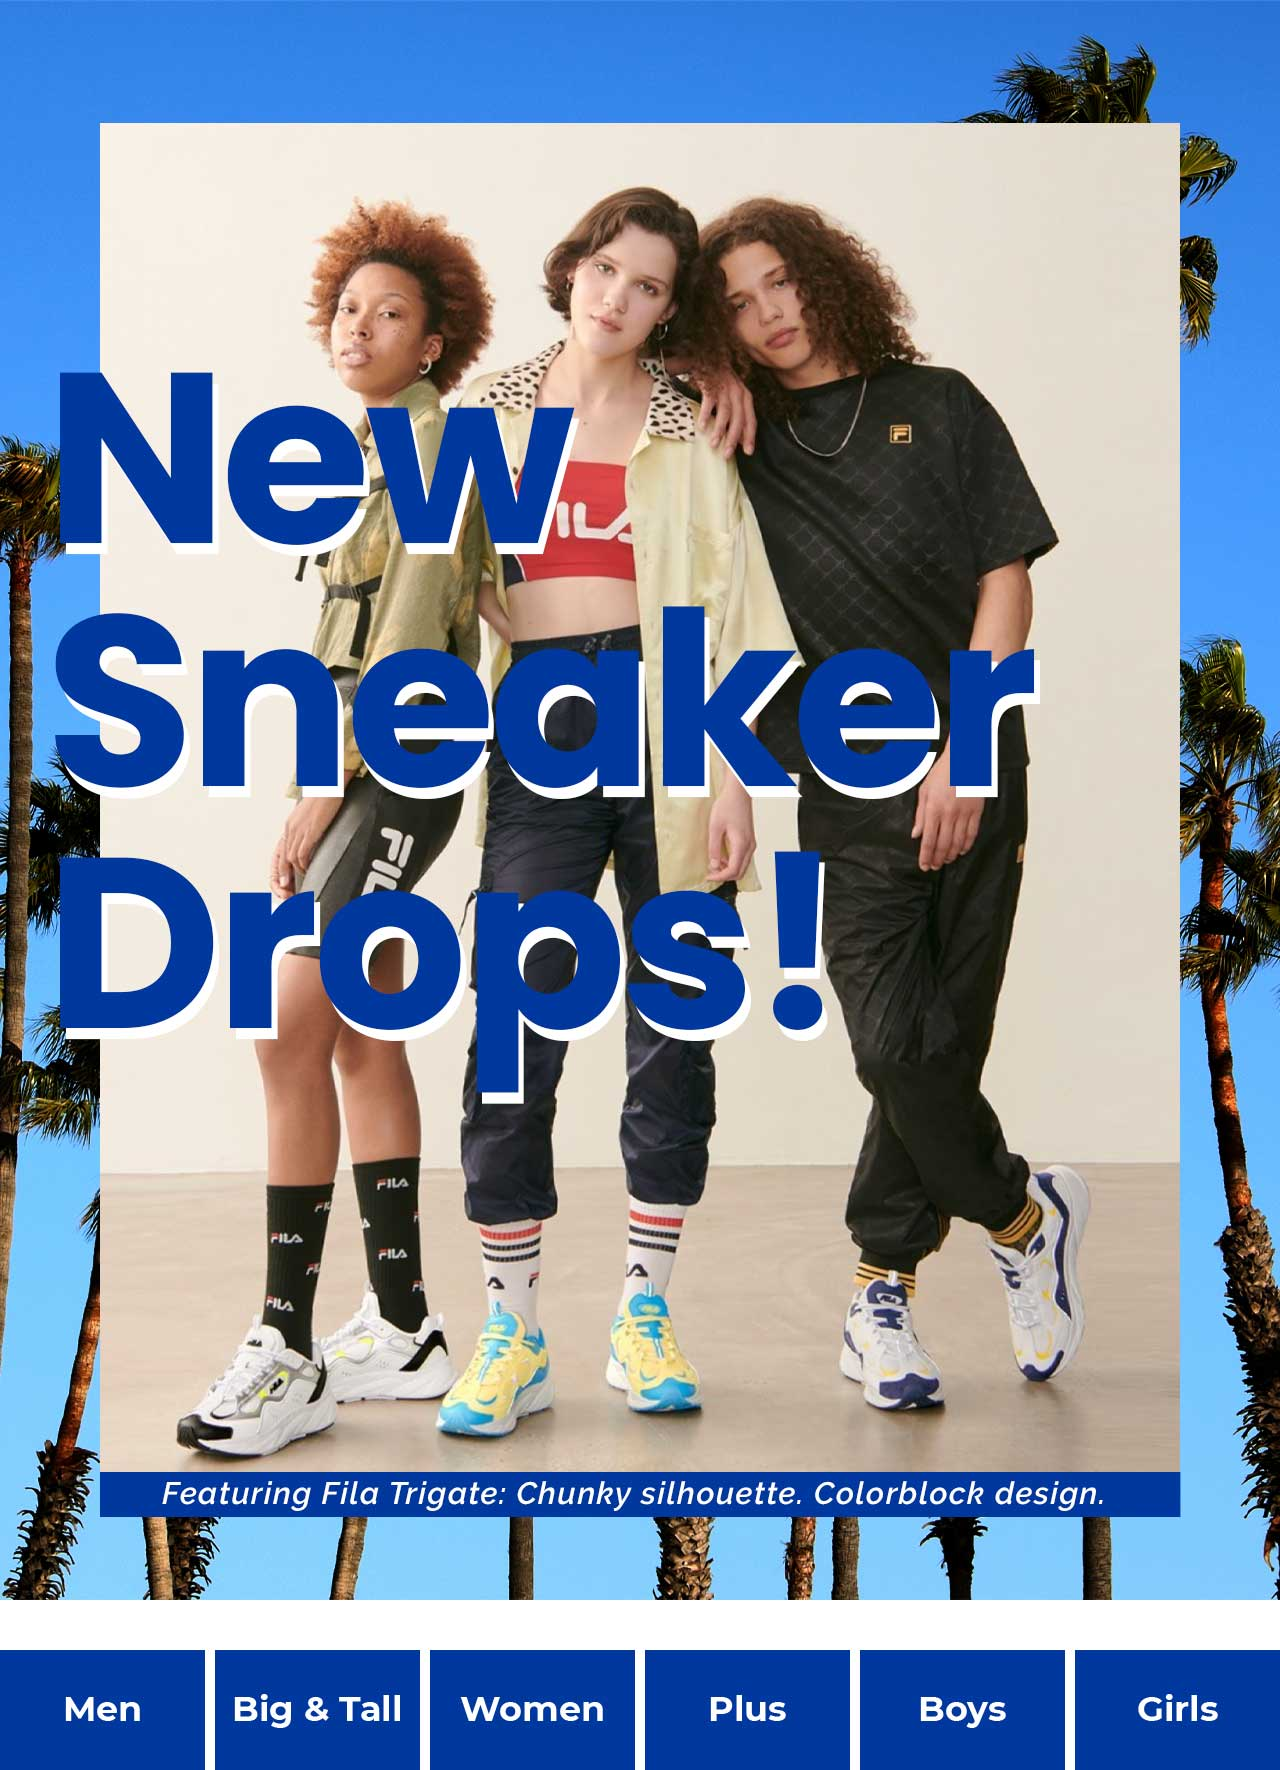 dr jays mens sneakers